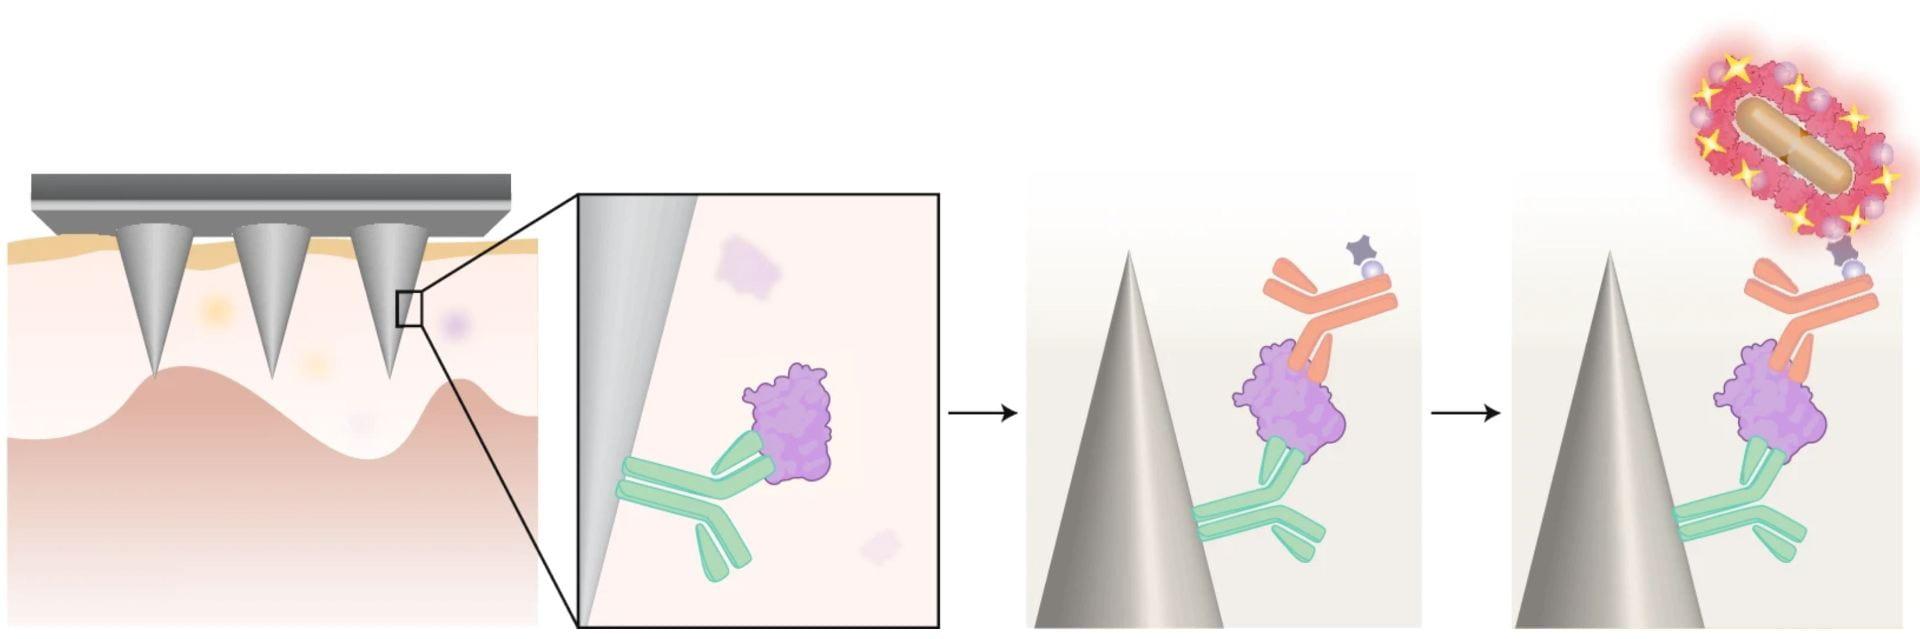 Microneedles for ultrasensitive biomarker detection